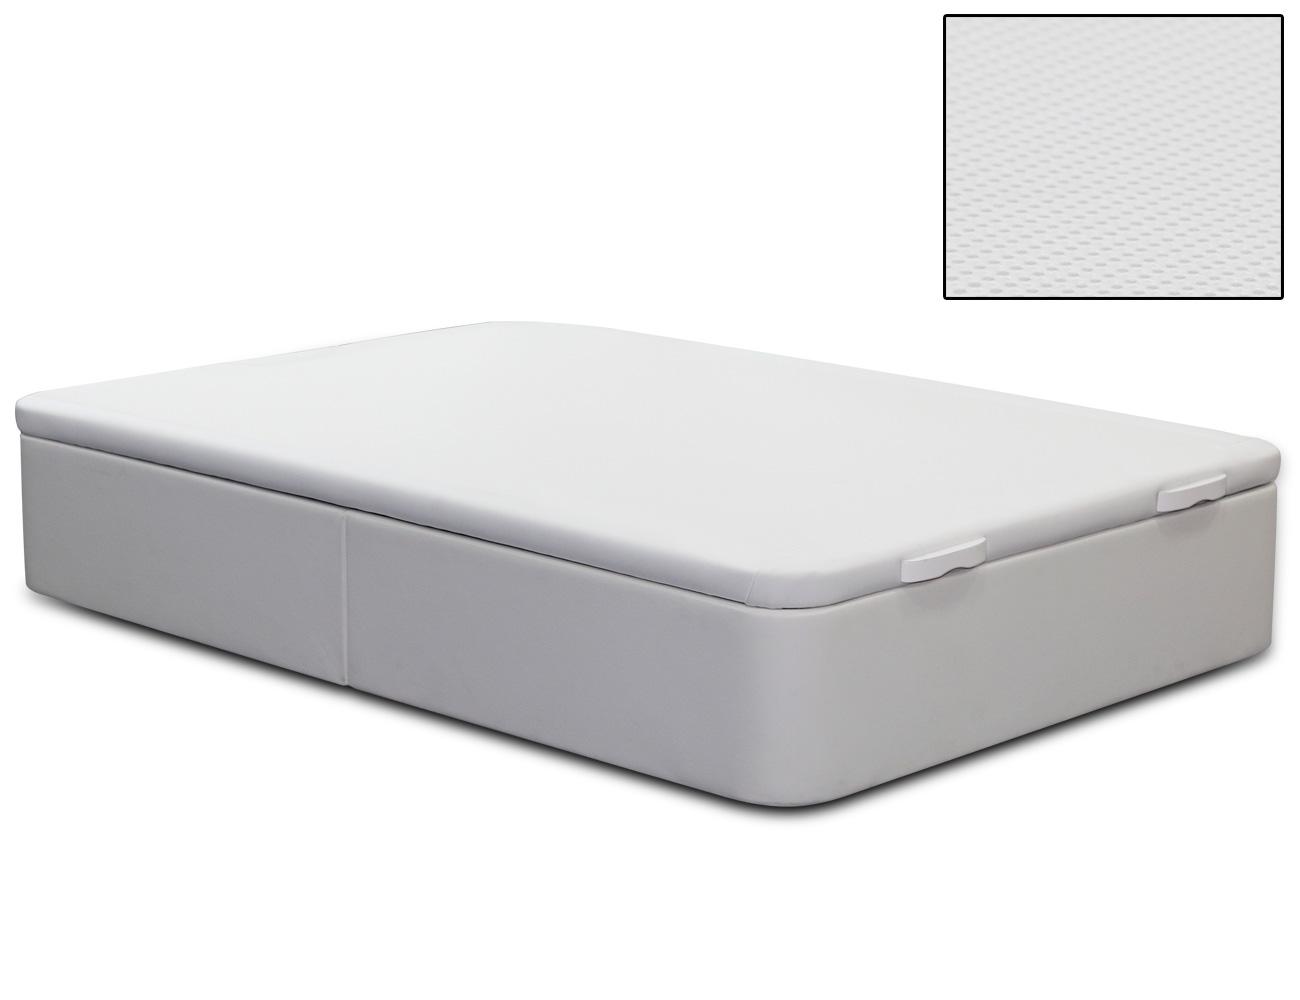 Canape polipiel blanco hercules tapa 3d